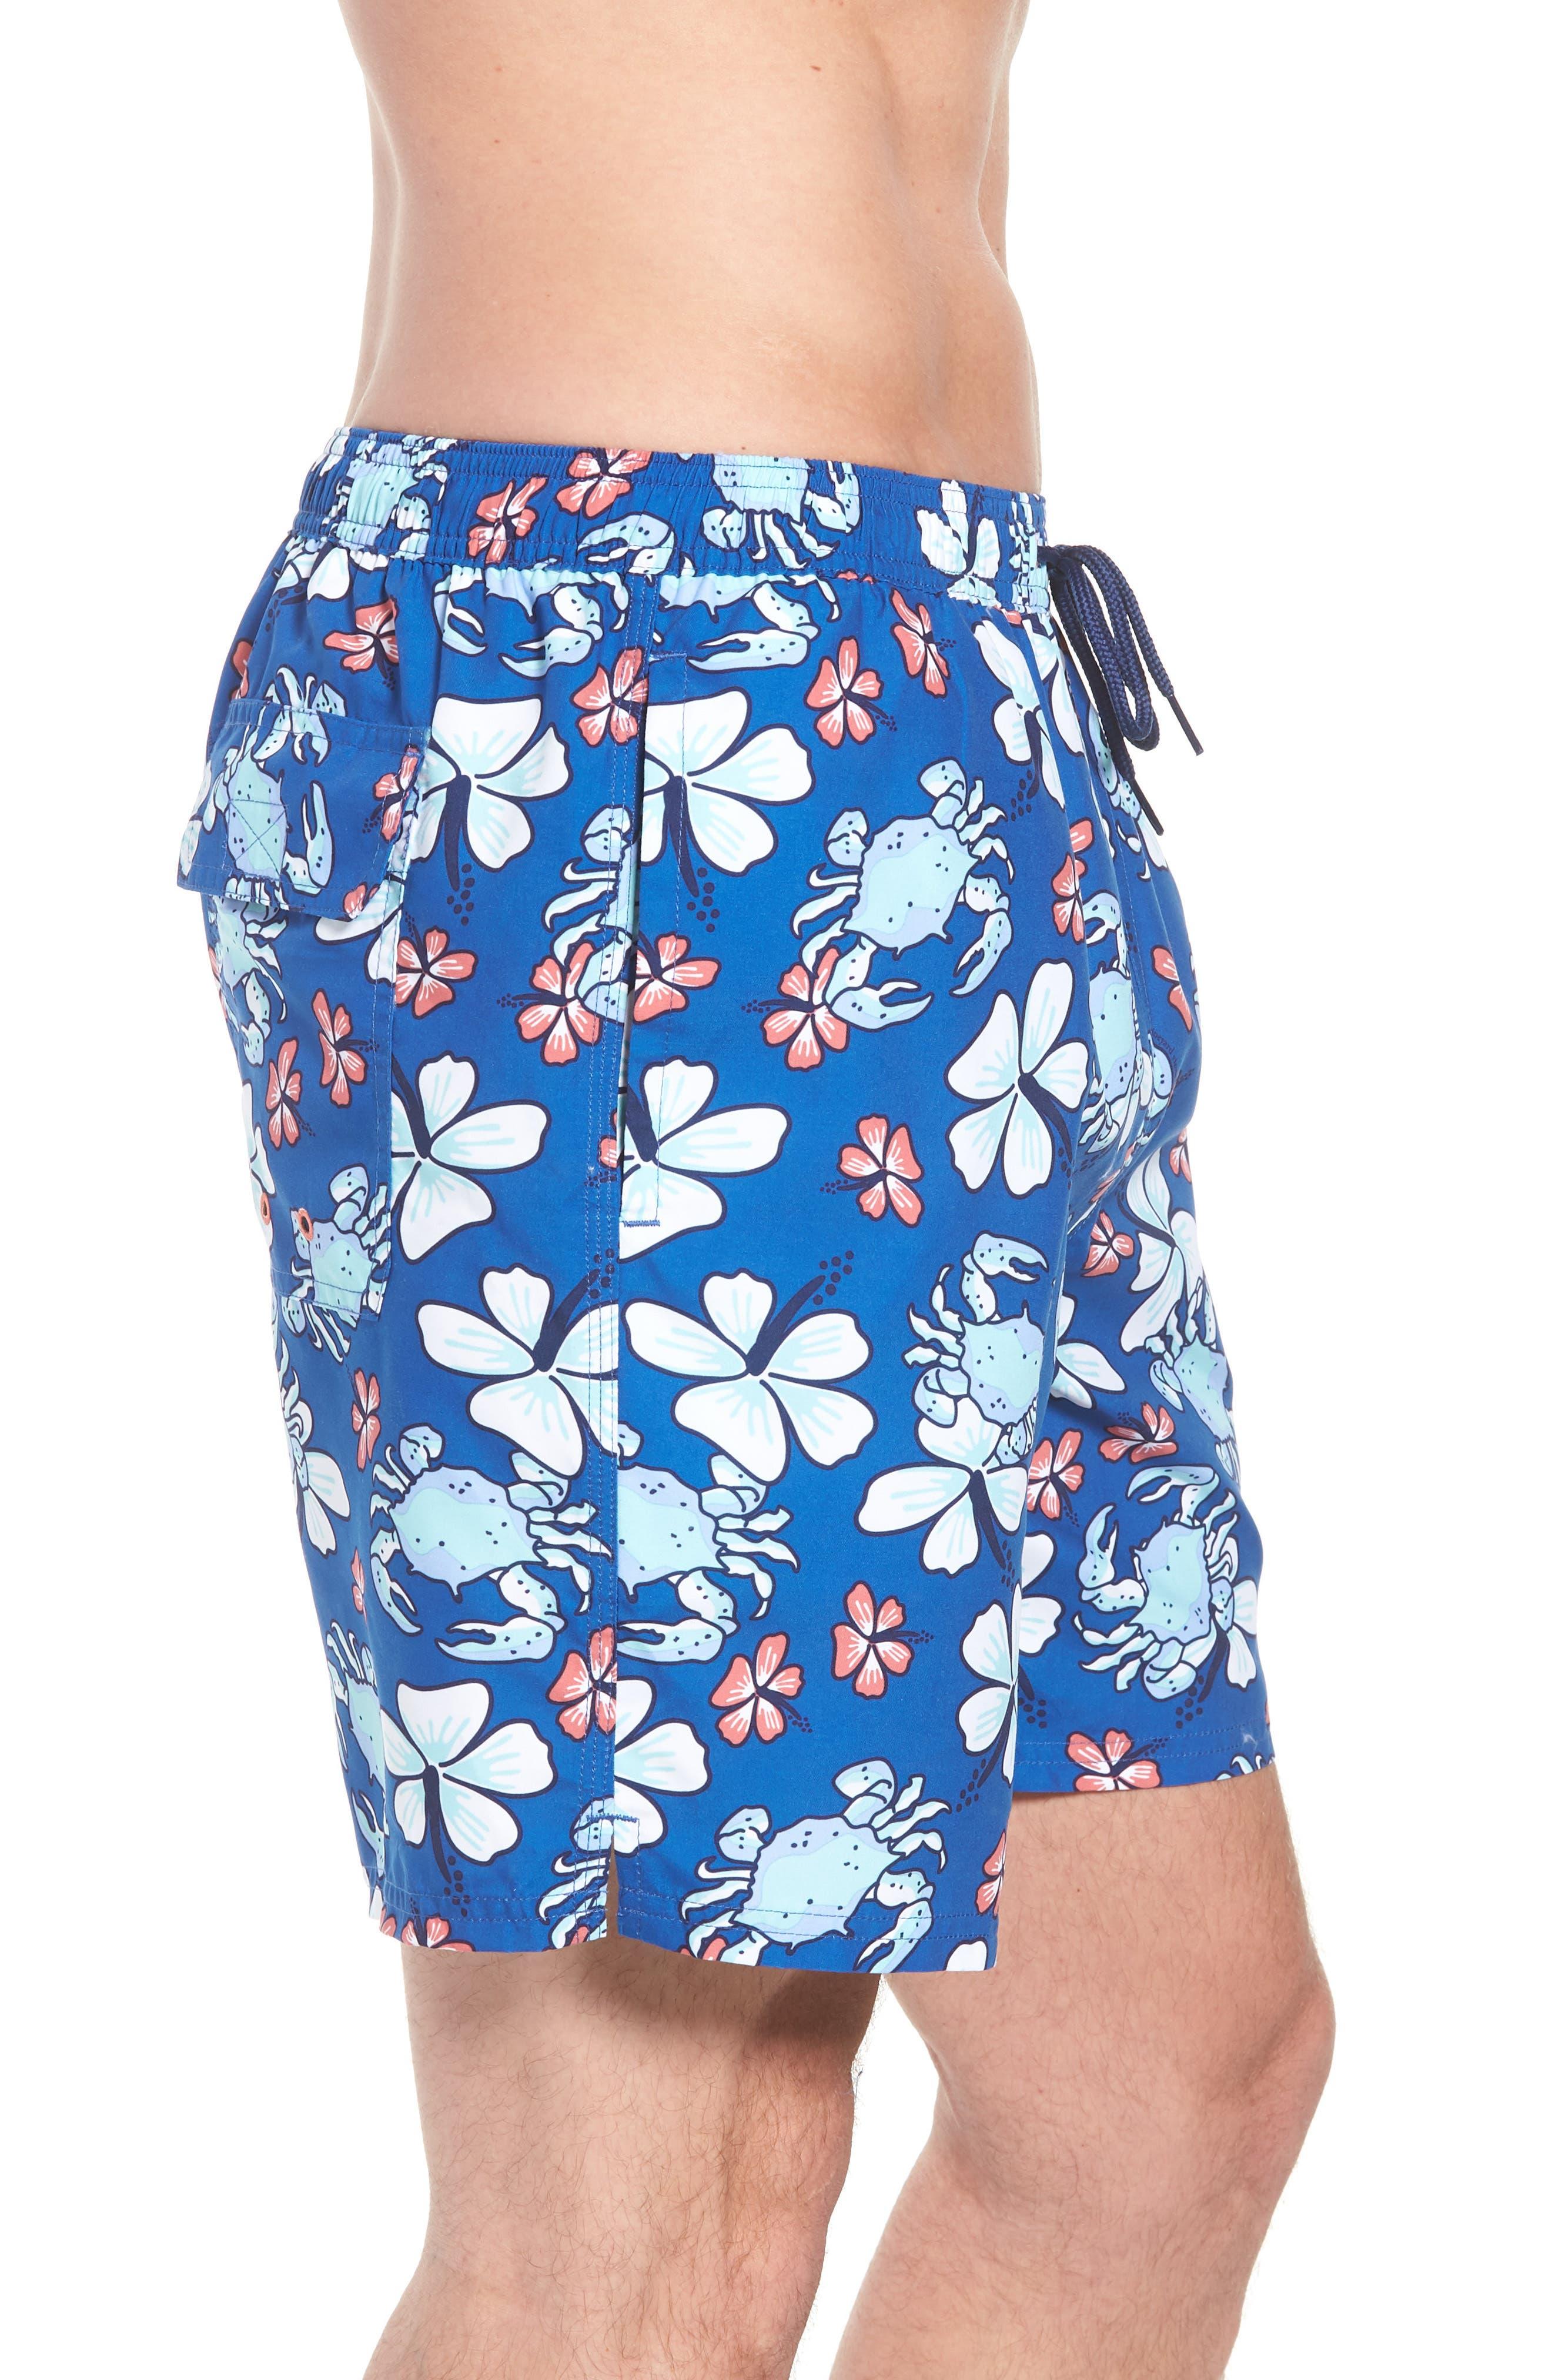 Chappy Crab Floral Swim Trunks,                             Alternate thumbnail 3, color,                             Yacht Blue